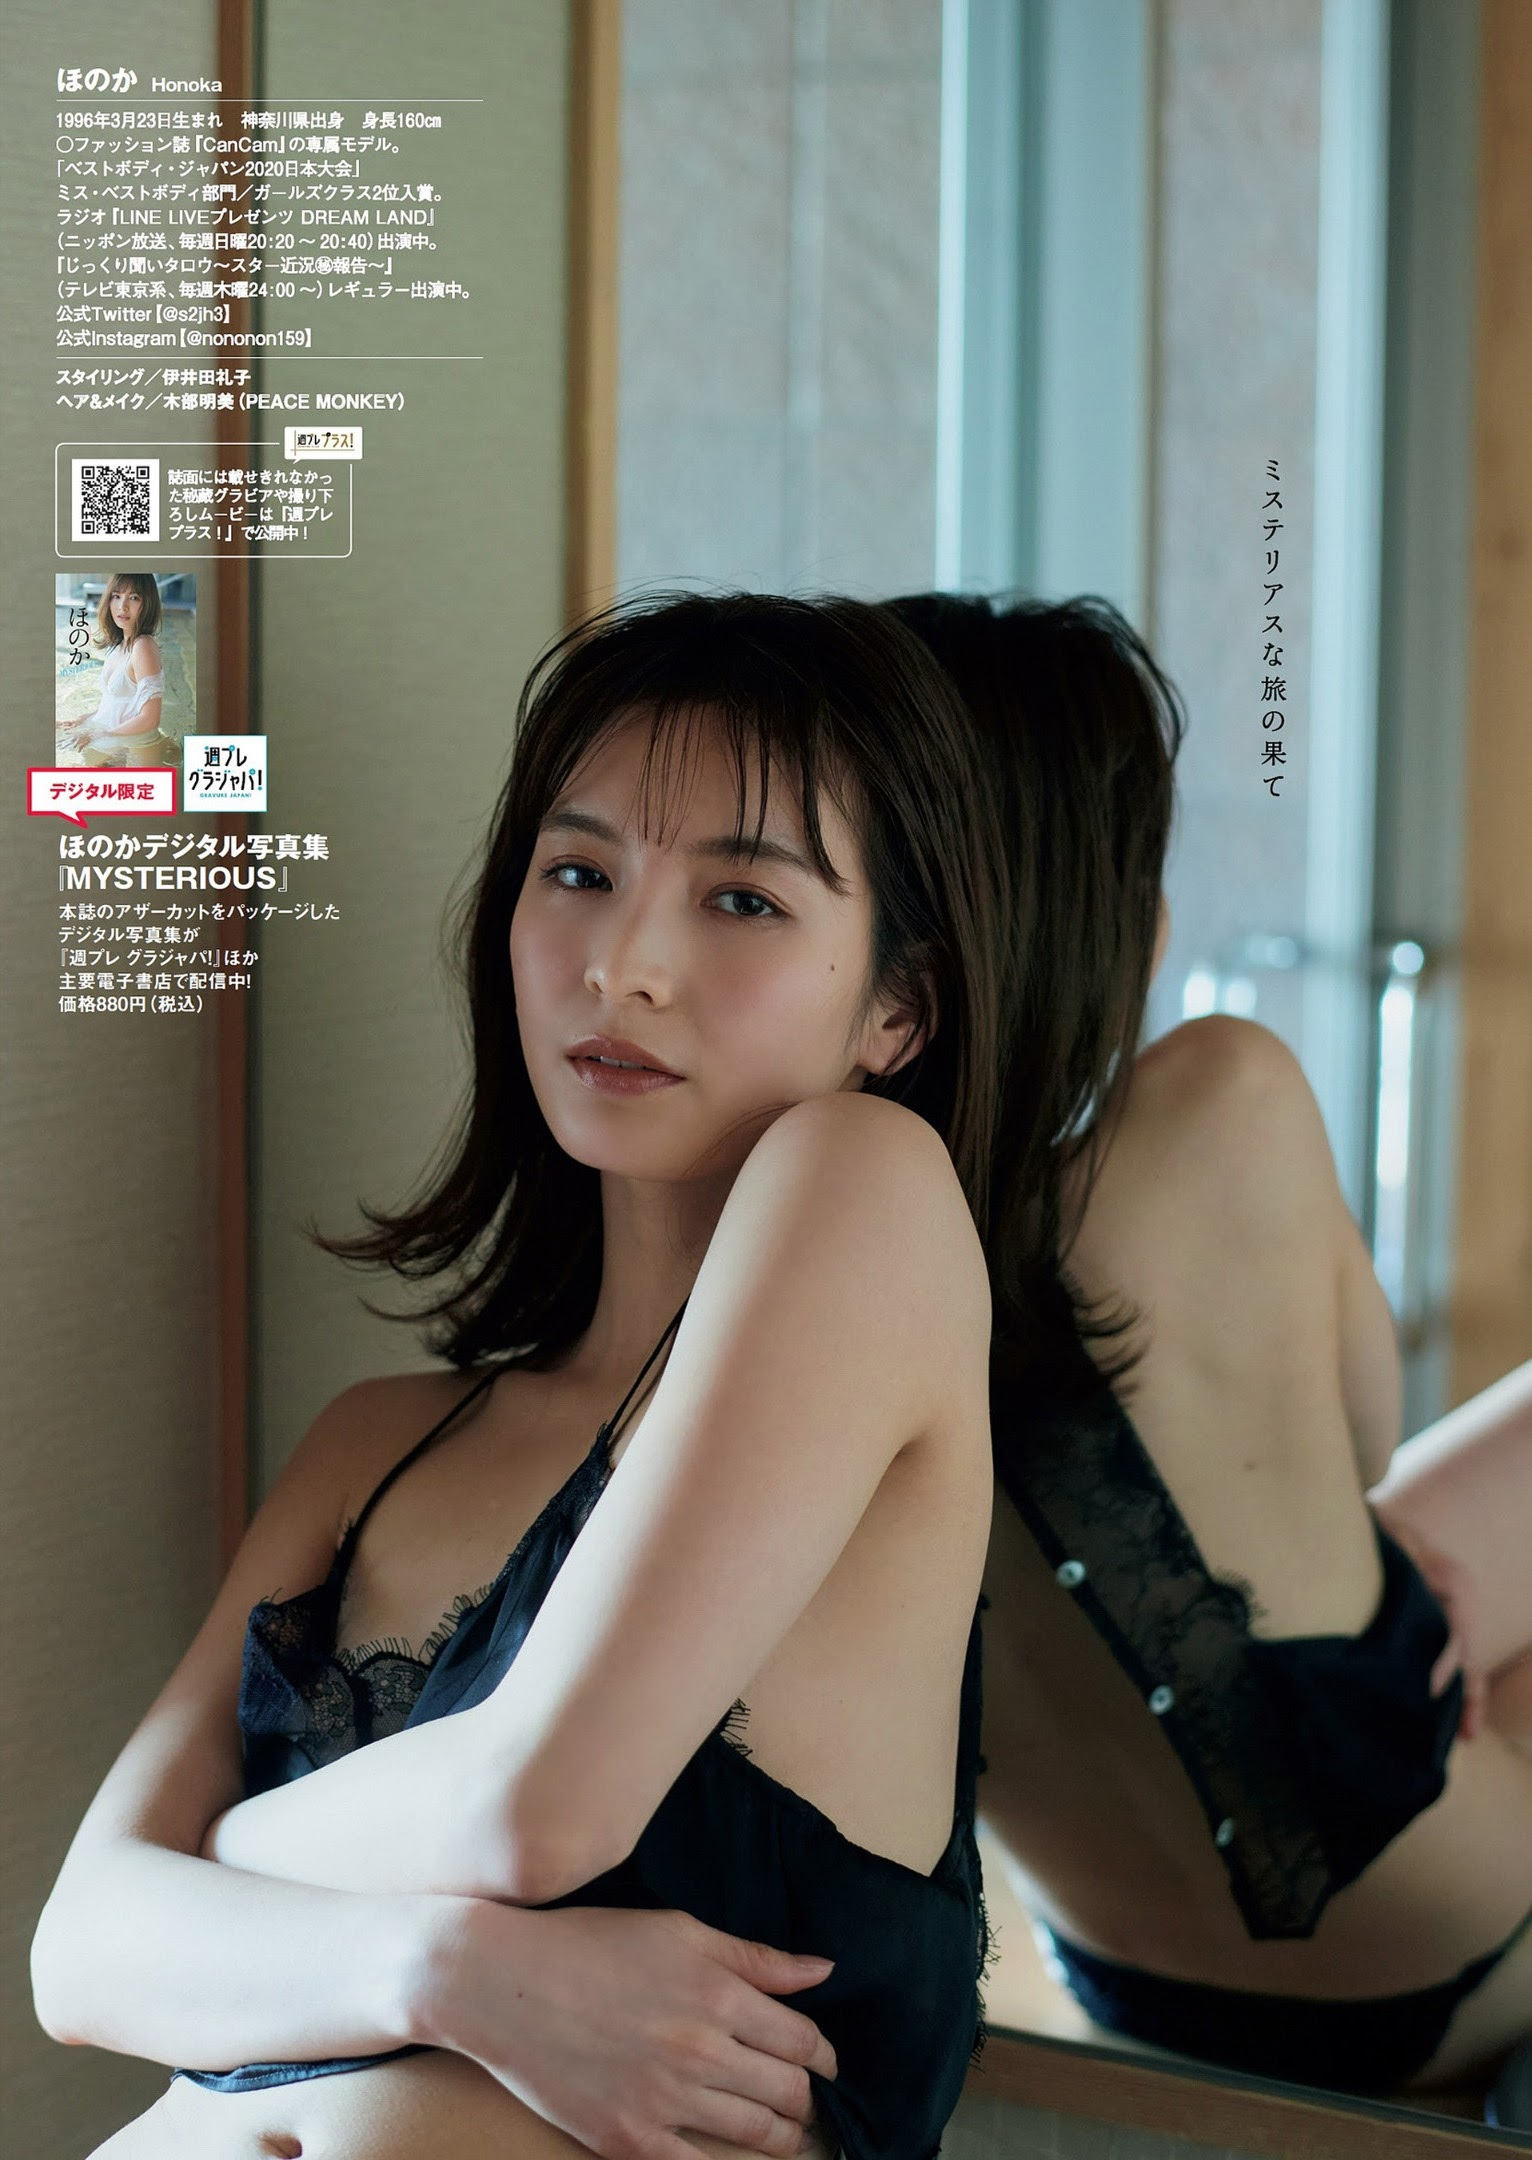 小山璃奈 頓知気さきな 伊藤美来-Weekly Playboy 2021年第十八期 高清套图 第61张